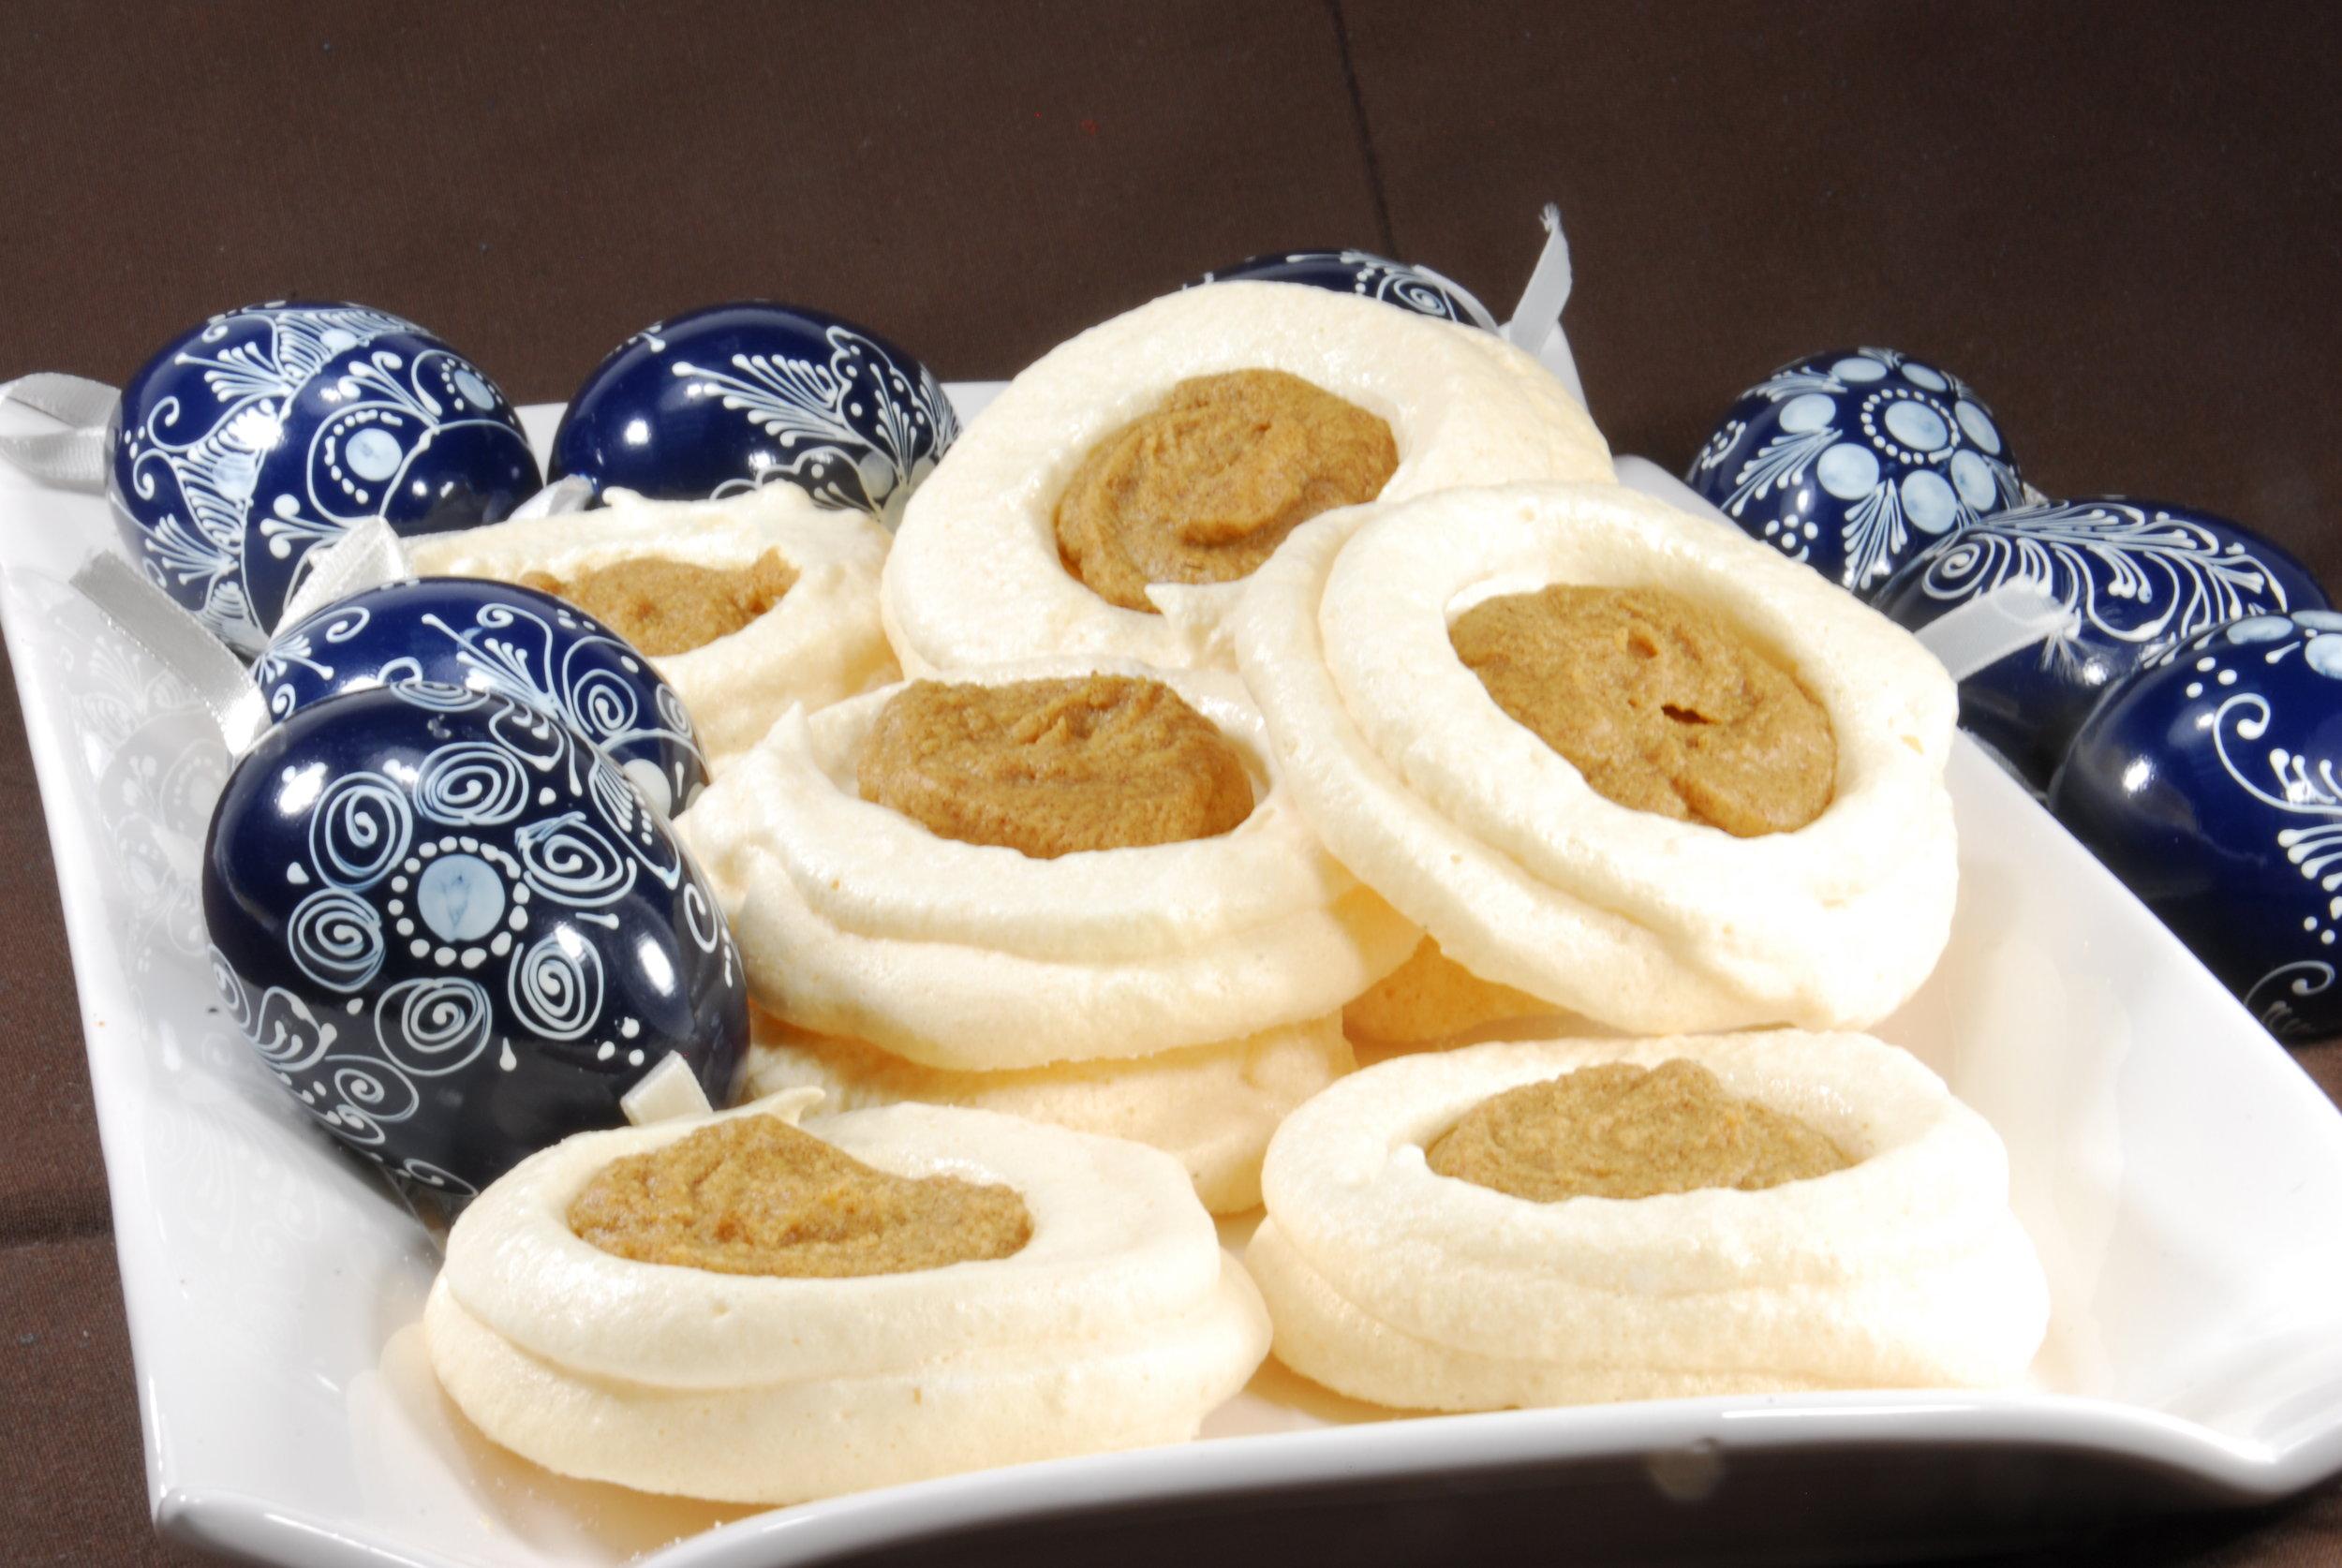 Easter meringue eggs with Forte orange date spread